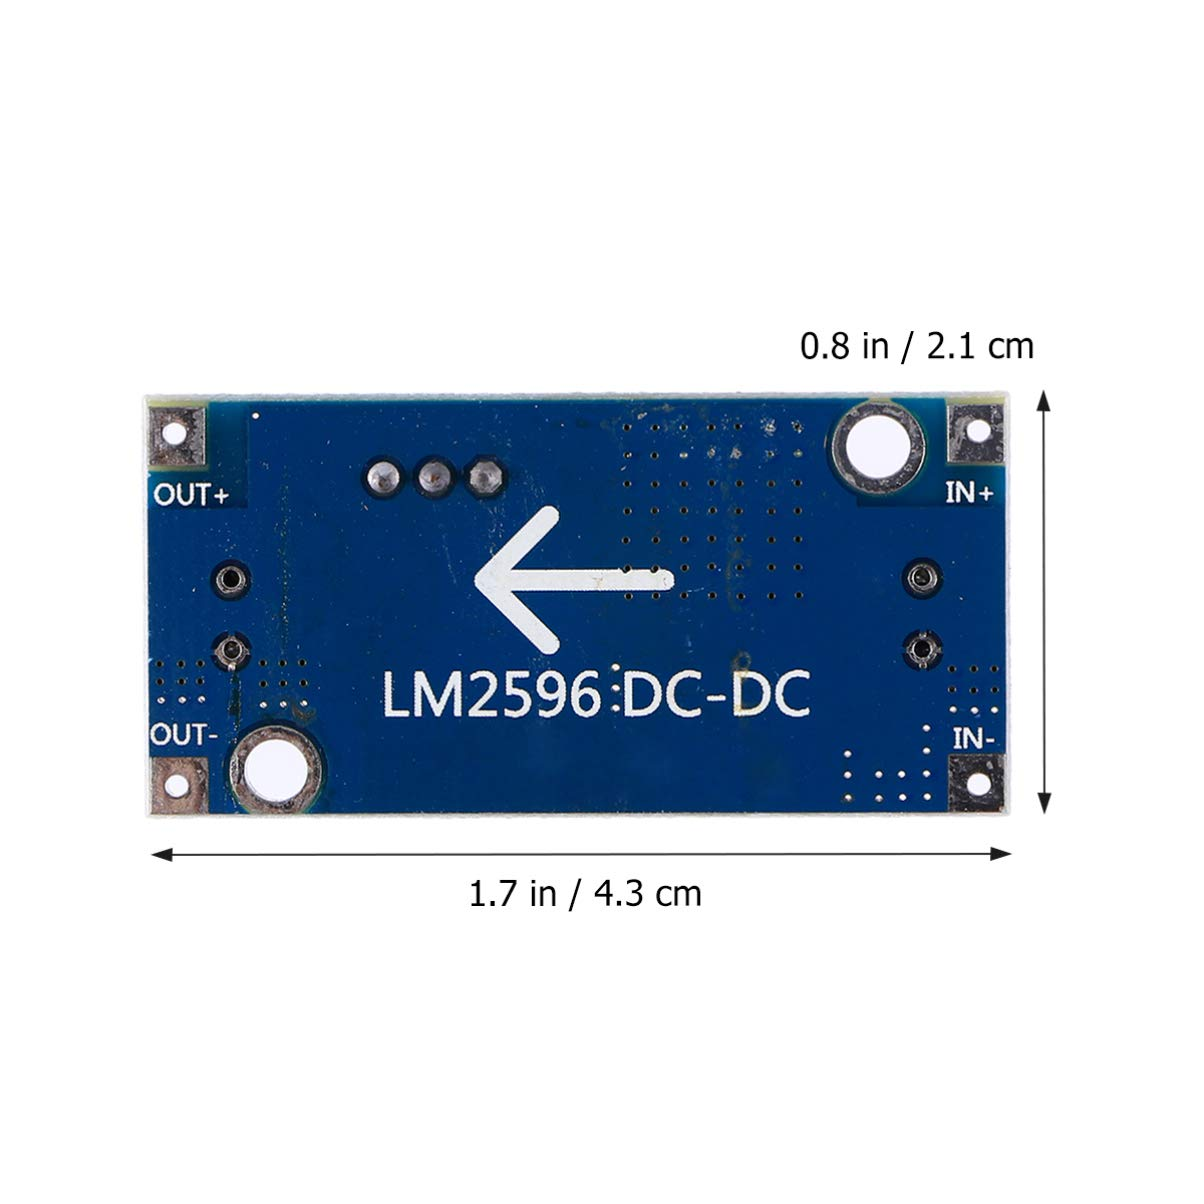 ULTECHNOVO 5pcs LM2596 Voltage Regulator Step Down Modules High Efficiency Adjustable Practical Module Buck Converter Power Supply DC-DC 1.23-30V